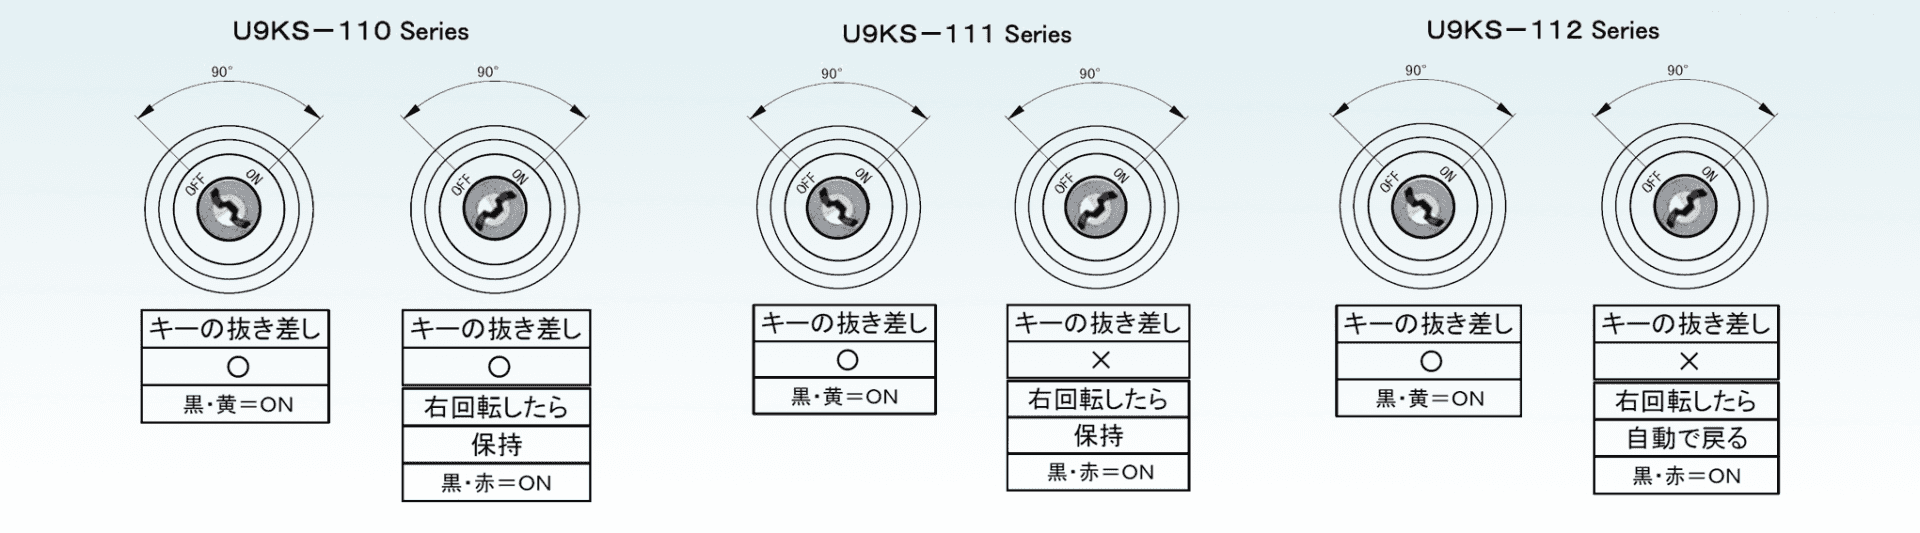 KS-110シリーズ一覧